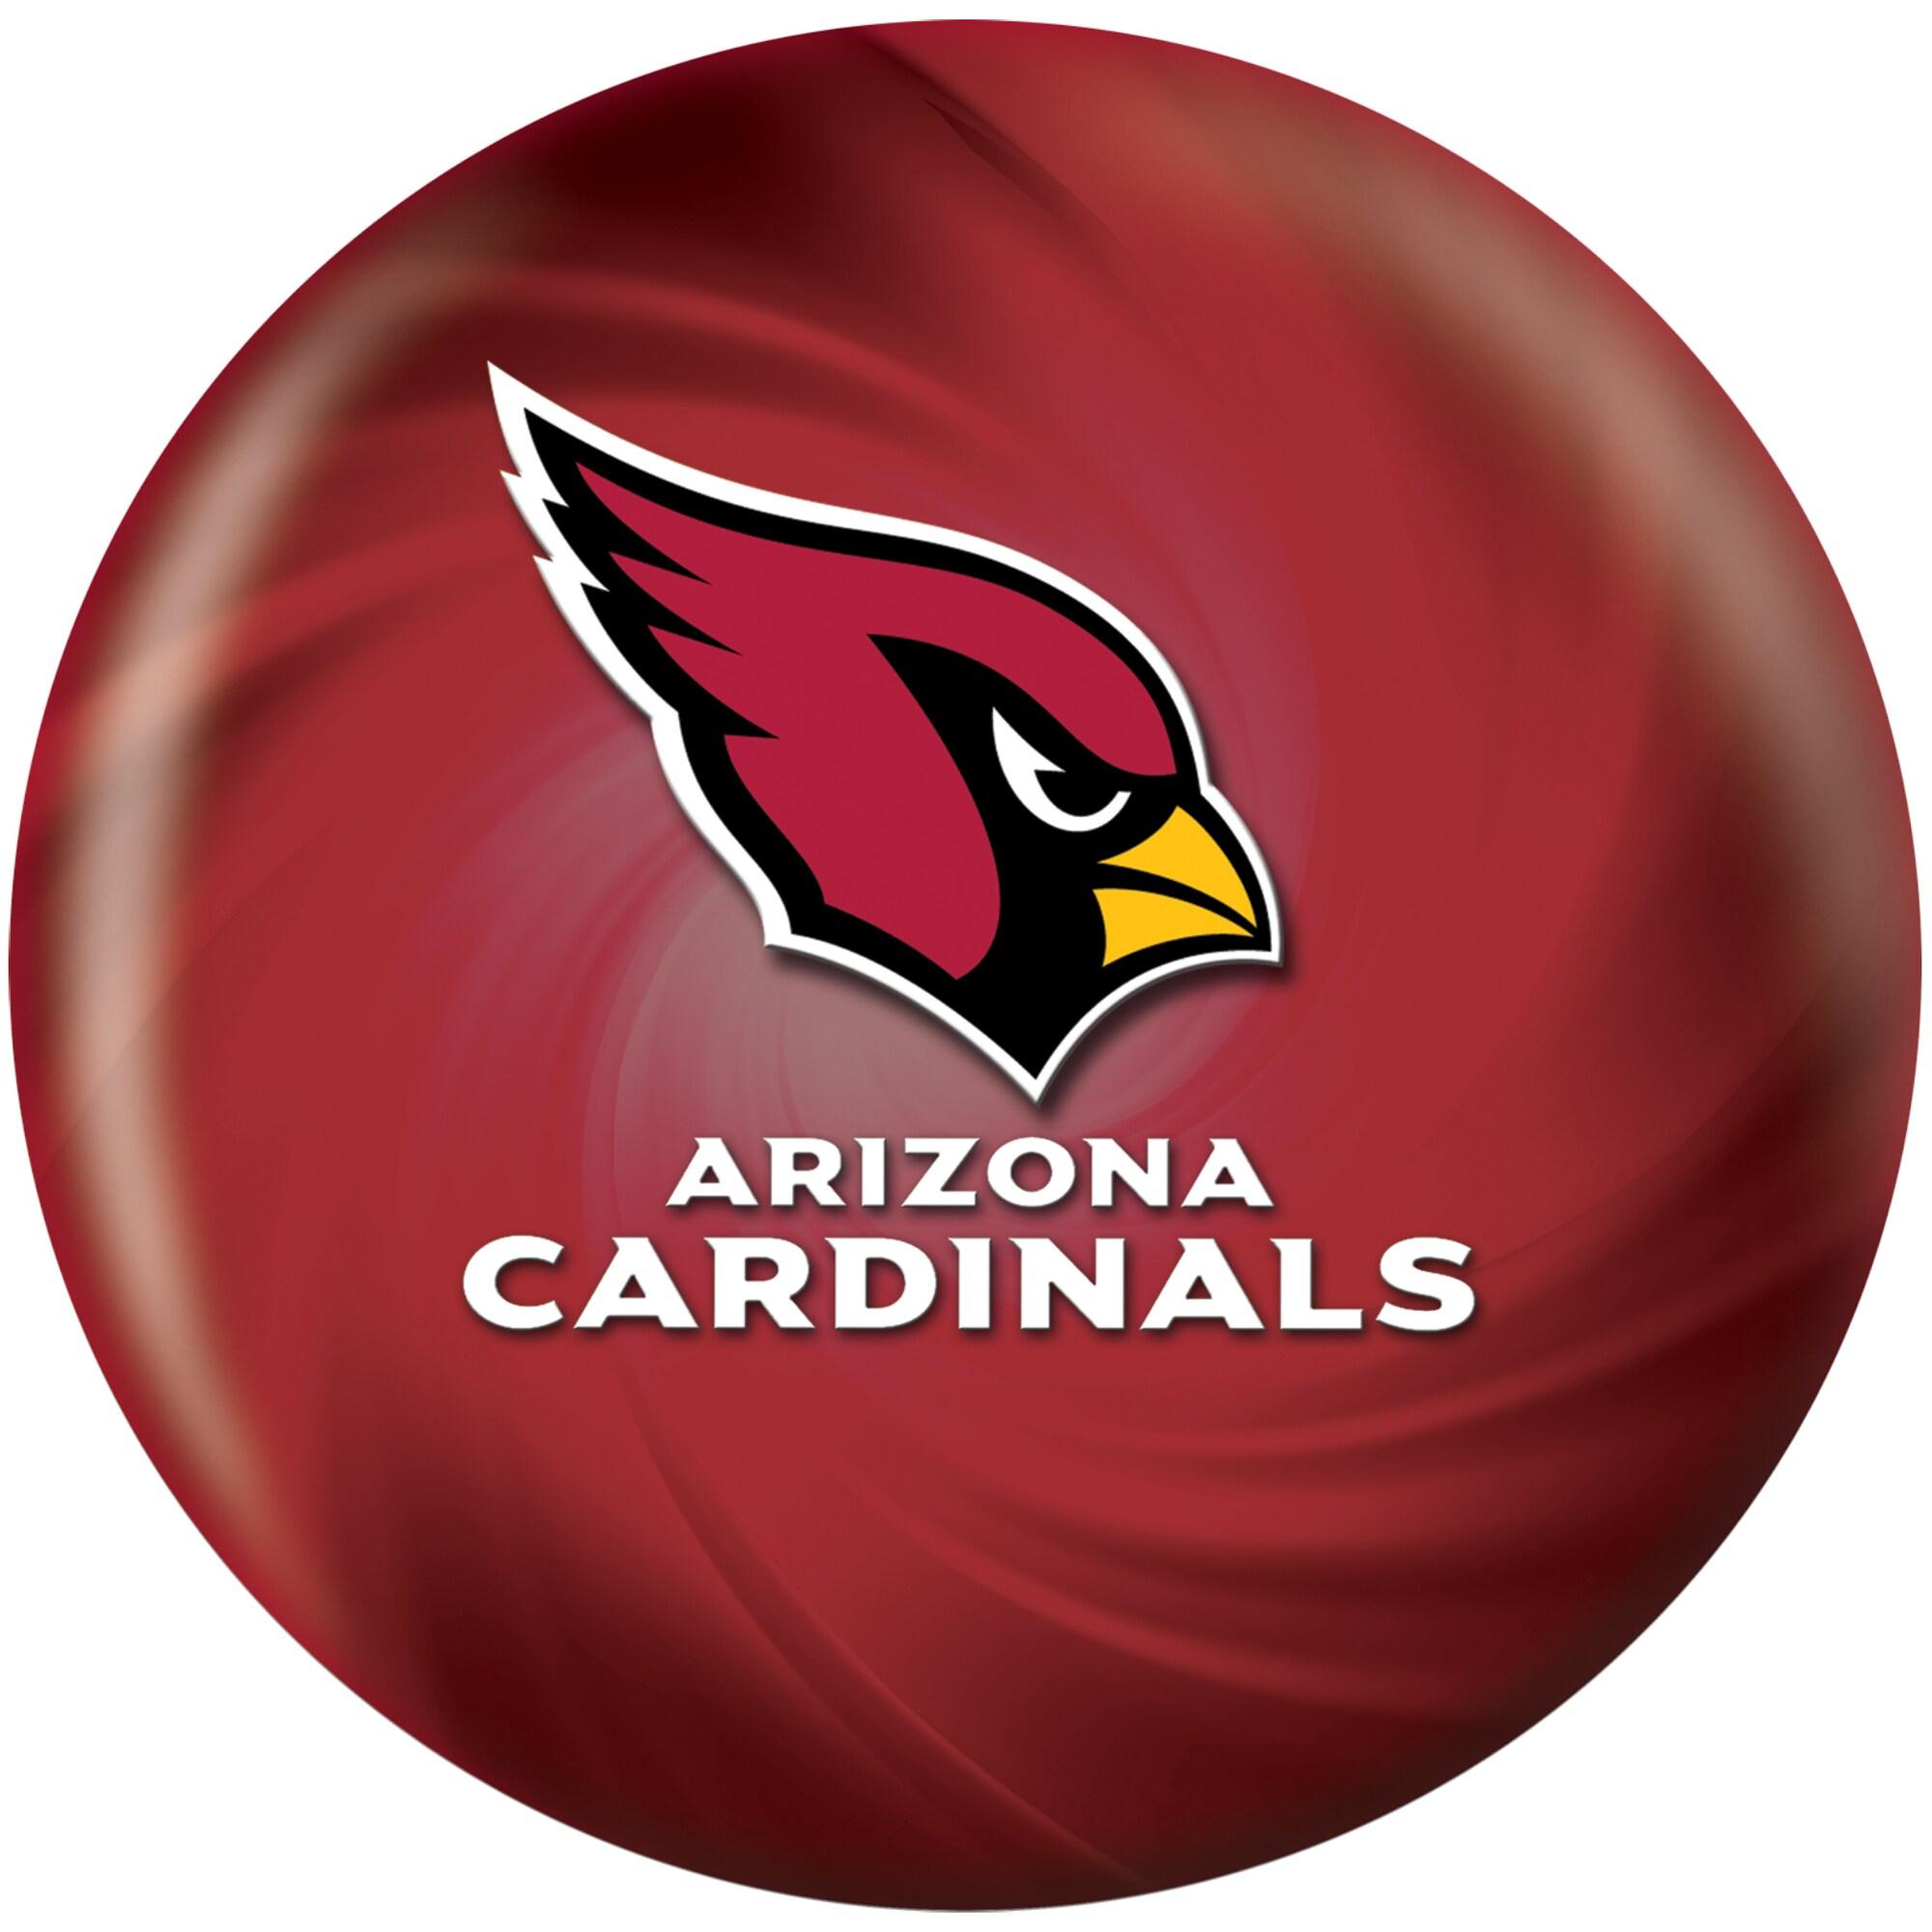 Arizona Cardinals Bowling Ball